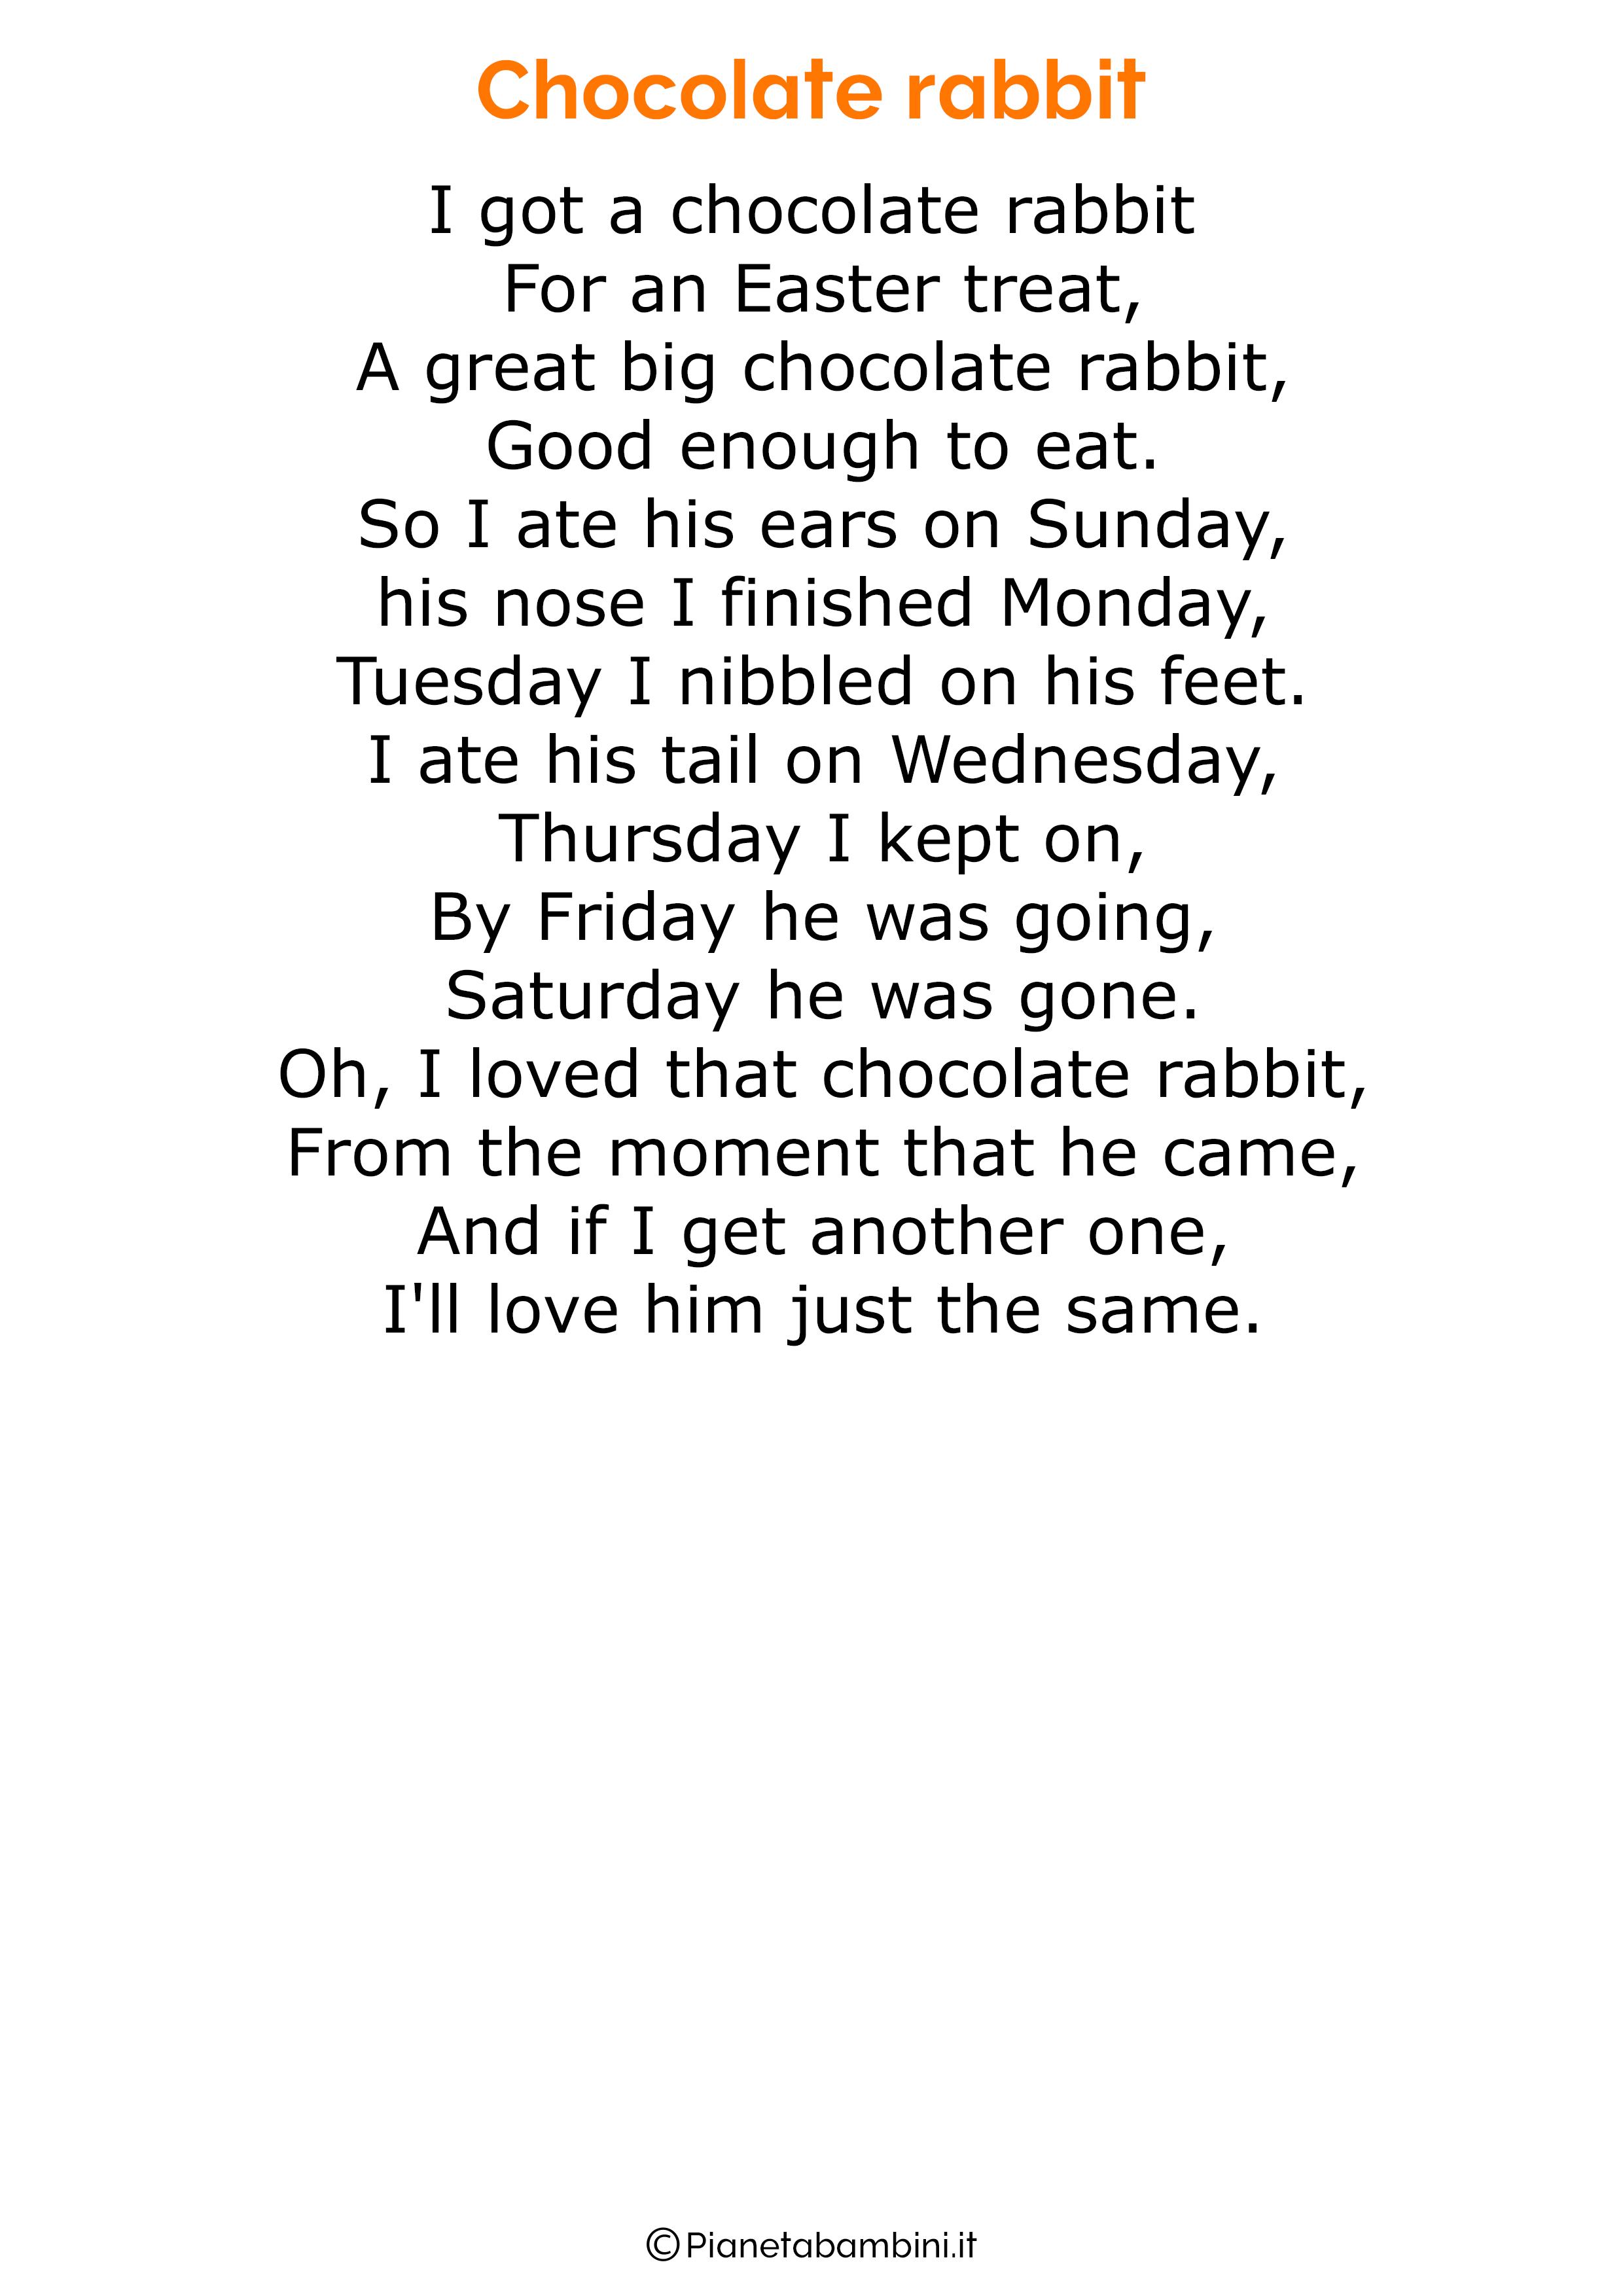 Poesie di Pasqua in inglese per bambini 09